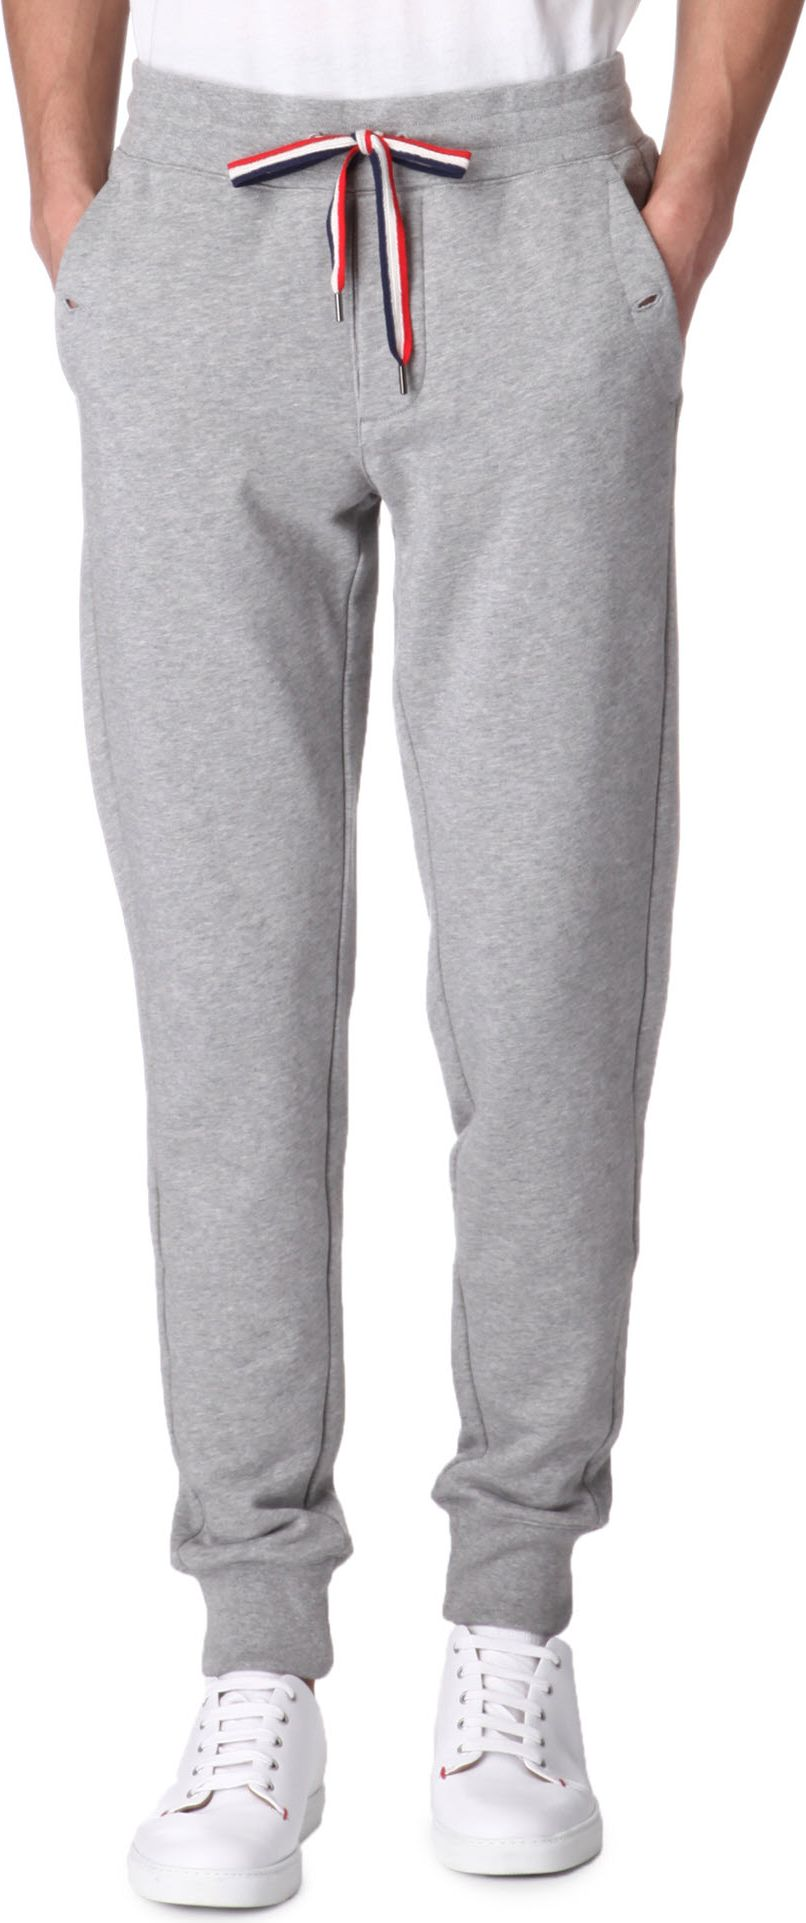 5a9fda459c2d Moncler Jogging Bottoms in Gray for Men - Lyst